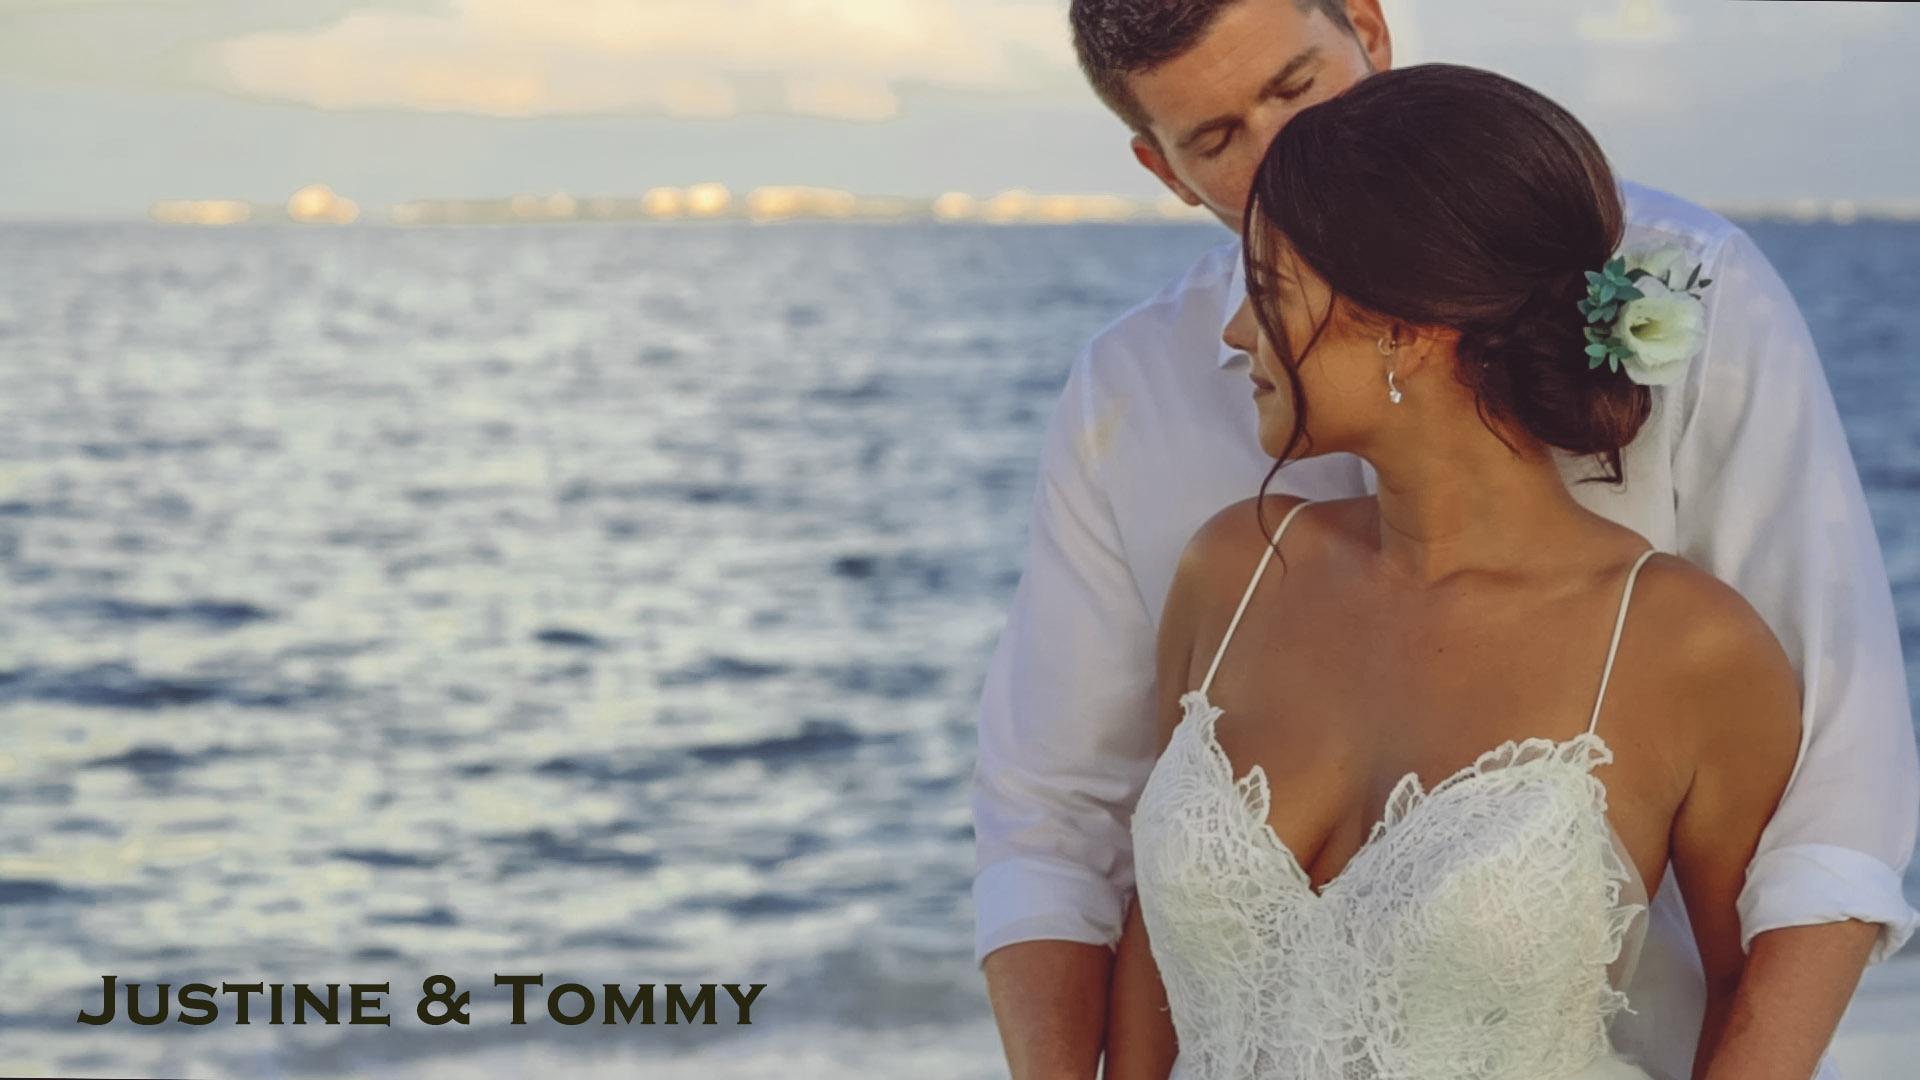 Destination Wedding at Secrets Playa Mujeres Resort – Justine & Tommy